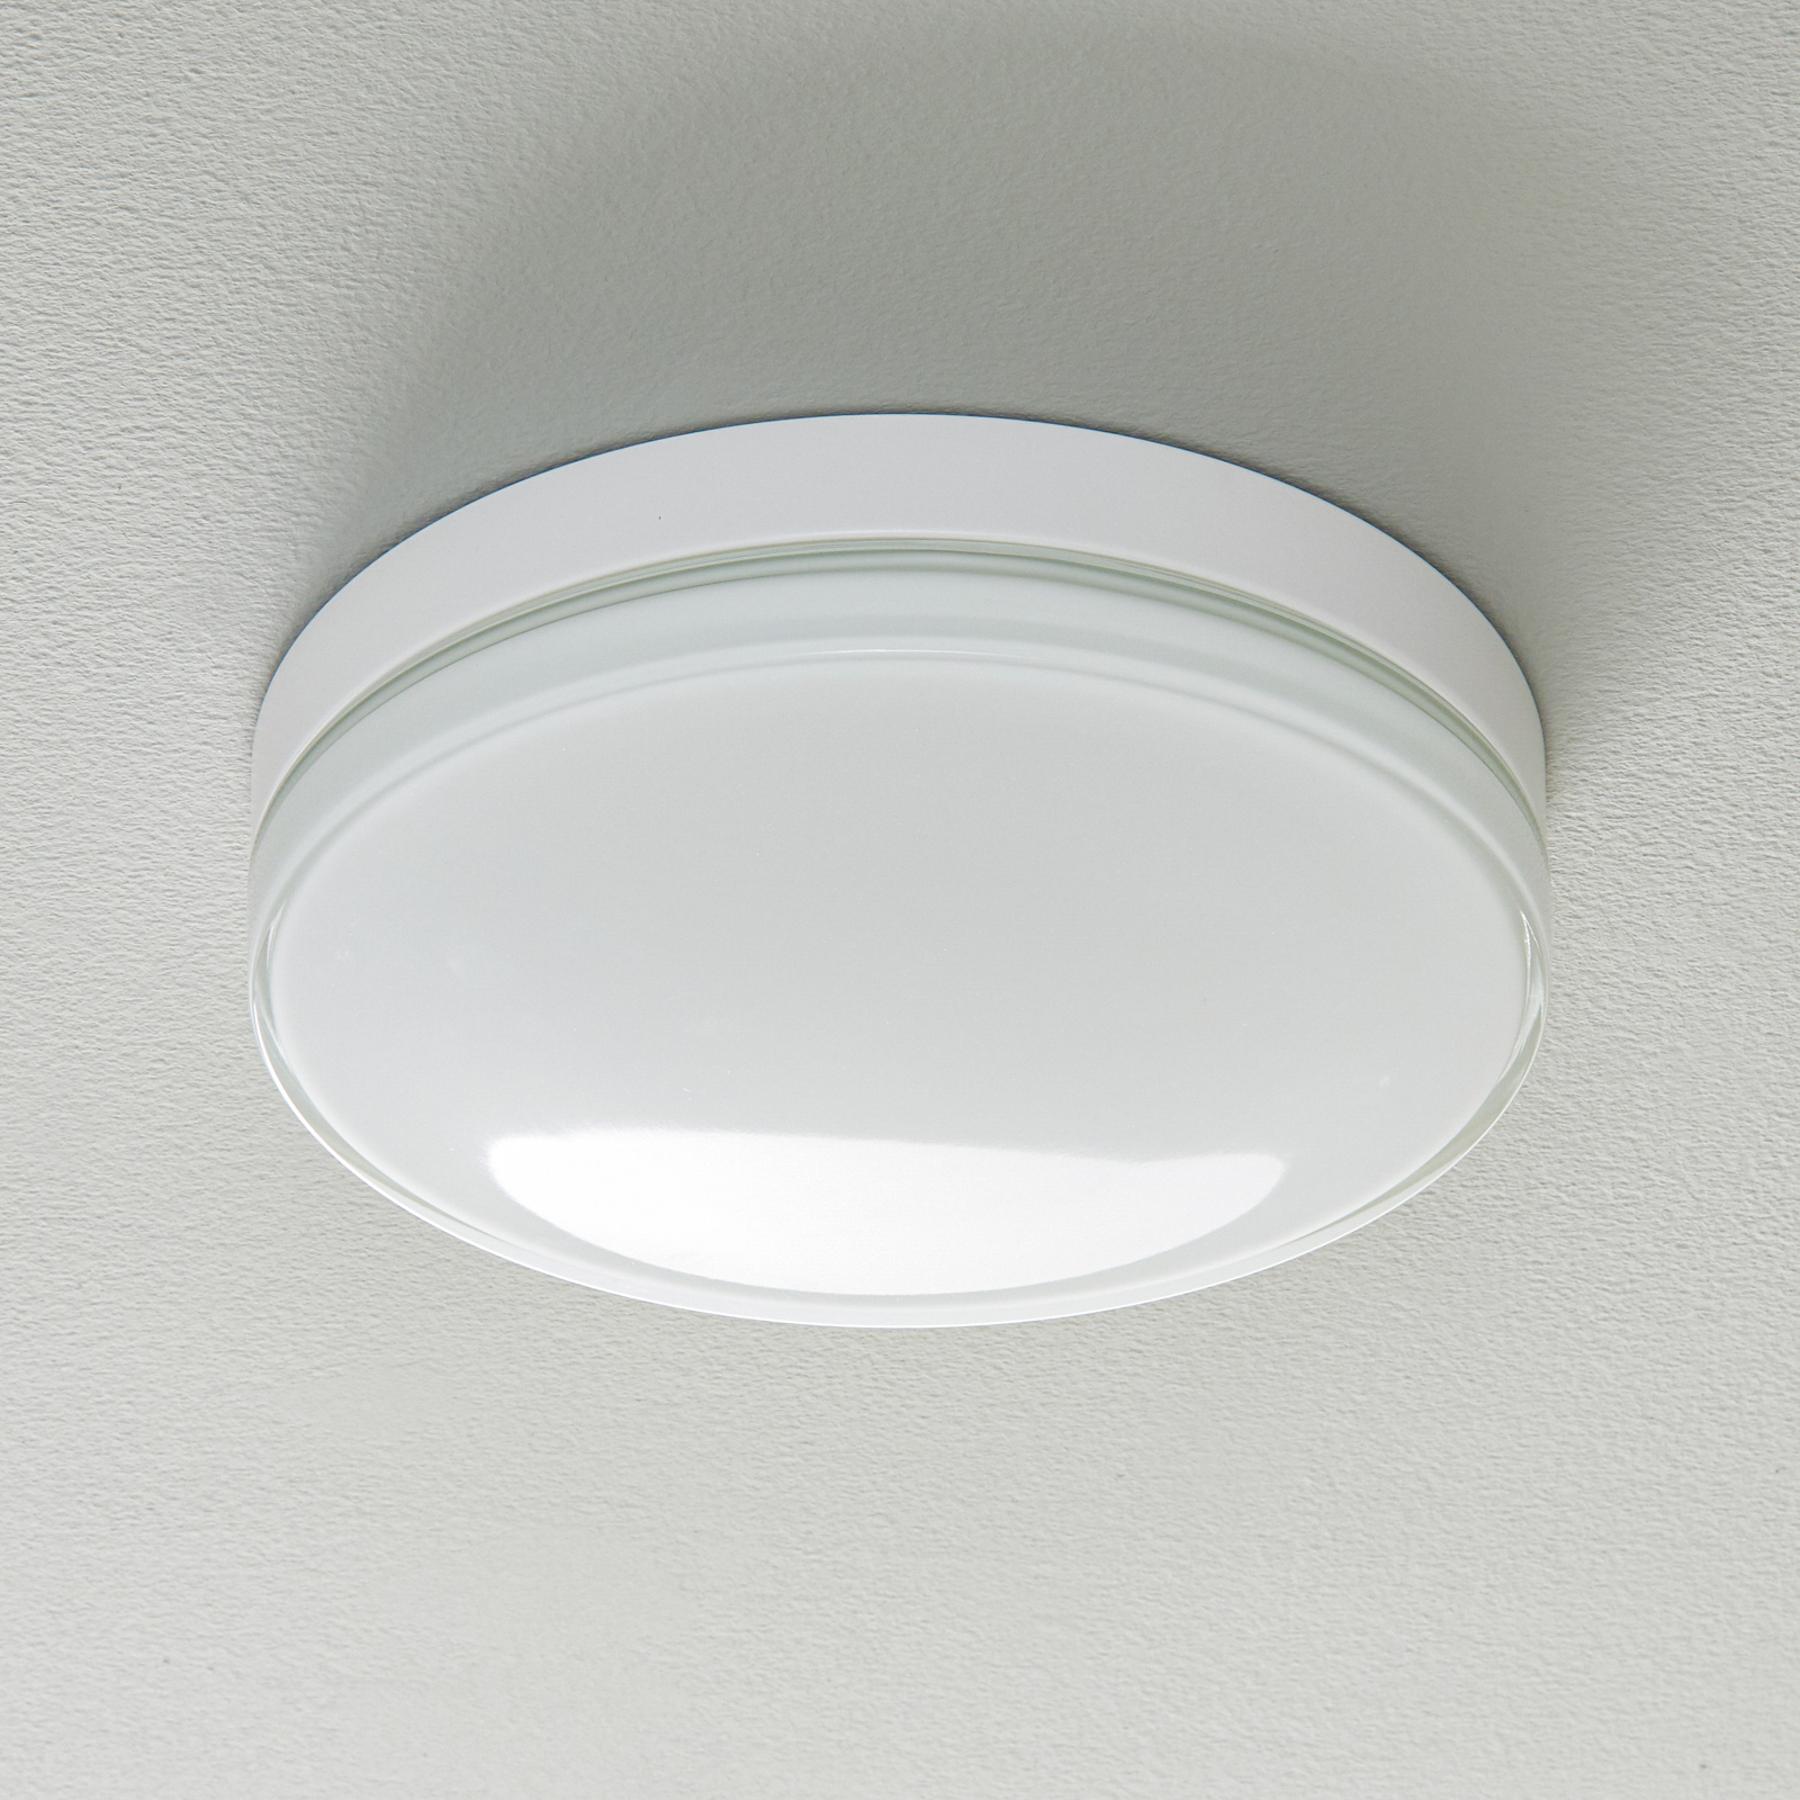 BEGA 12128 LED plafondlamp DALI 930 wit 30,5cm